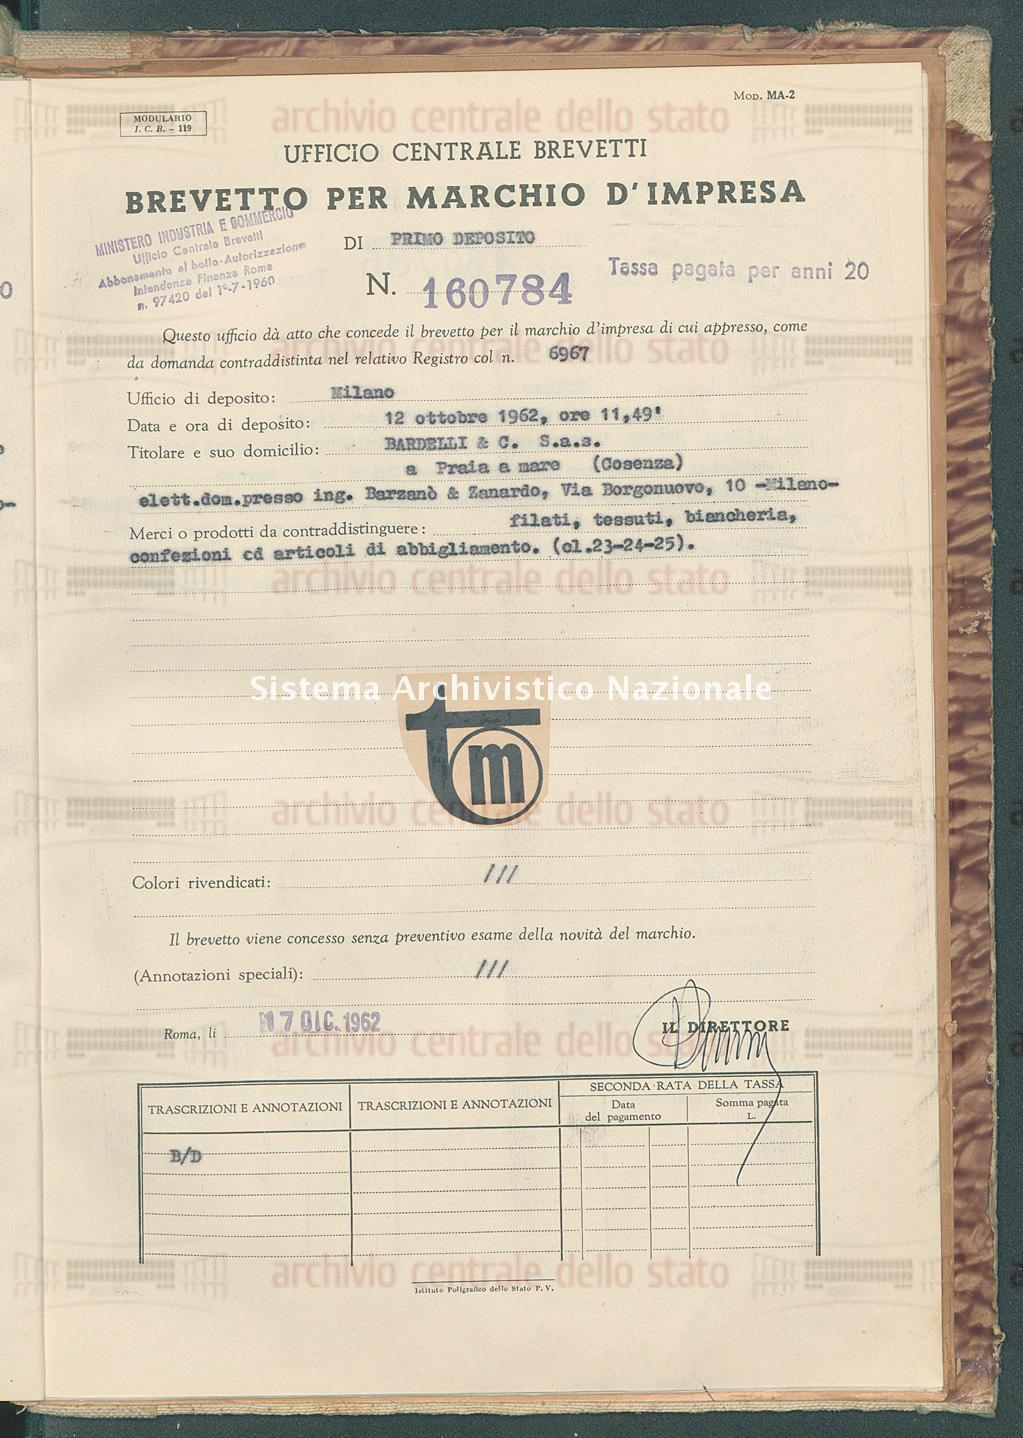 Filati, tessuti, biancheria ecc. Bardelli & C. S.A.S. (17/12/1962)